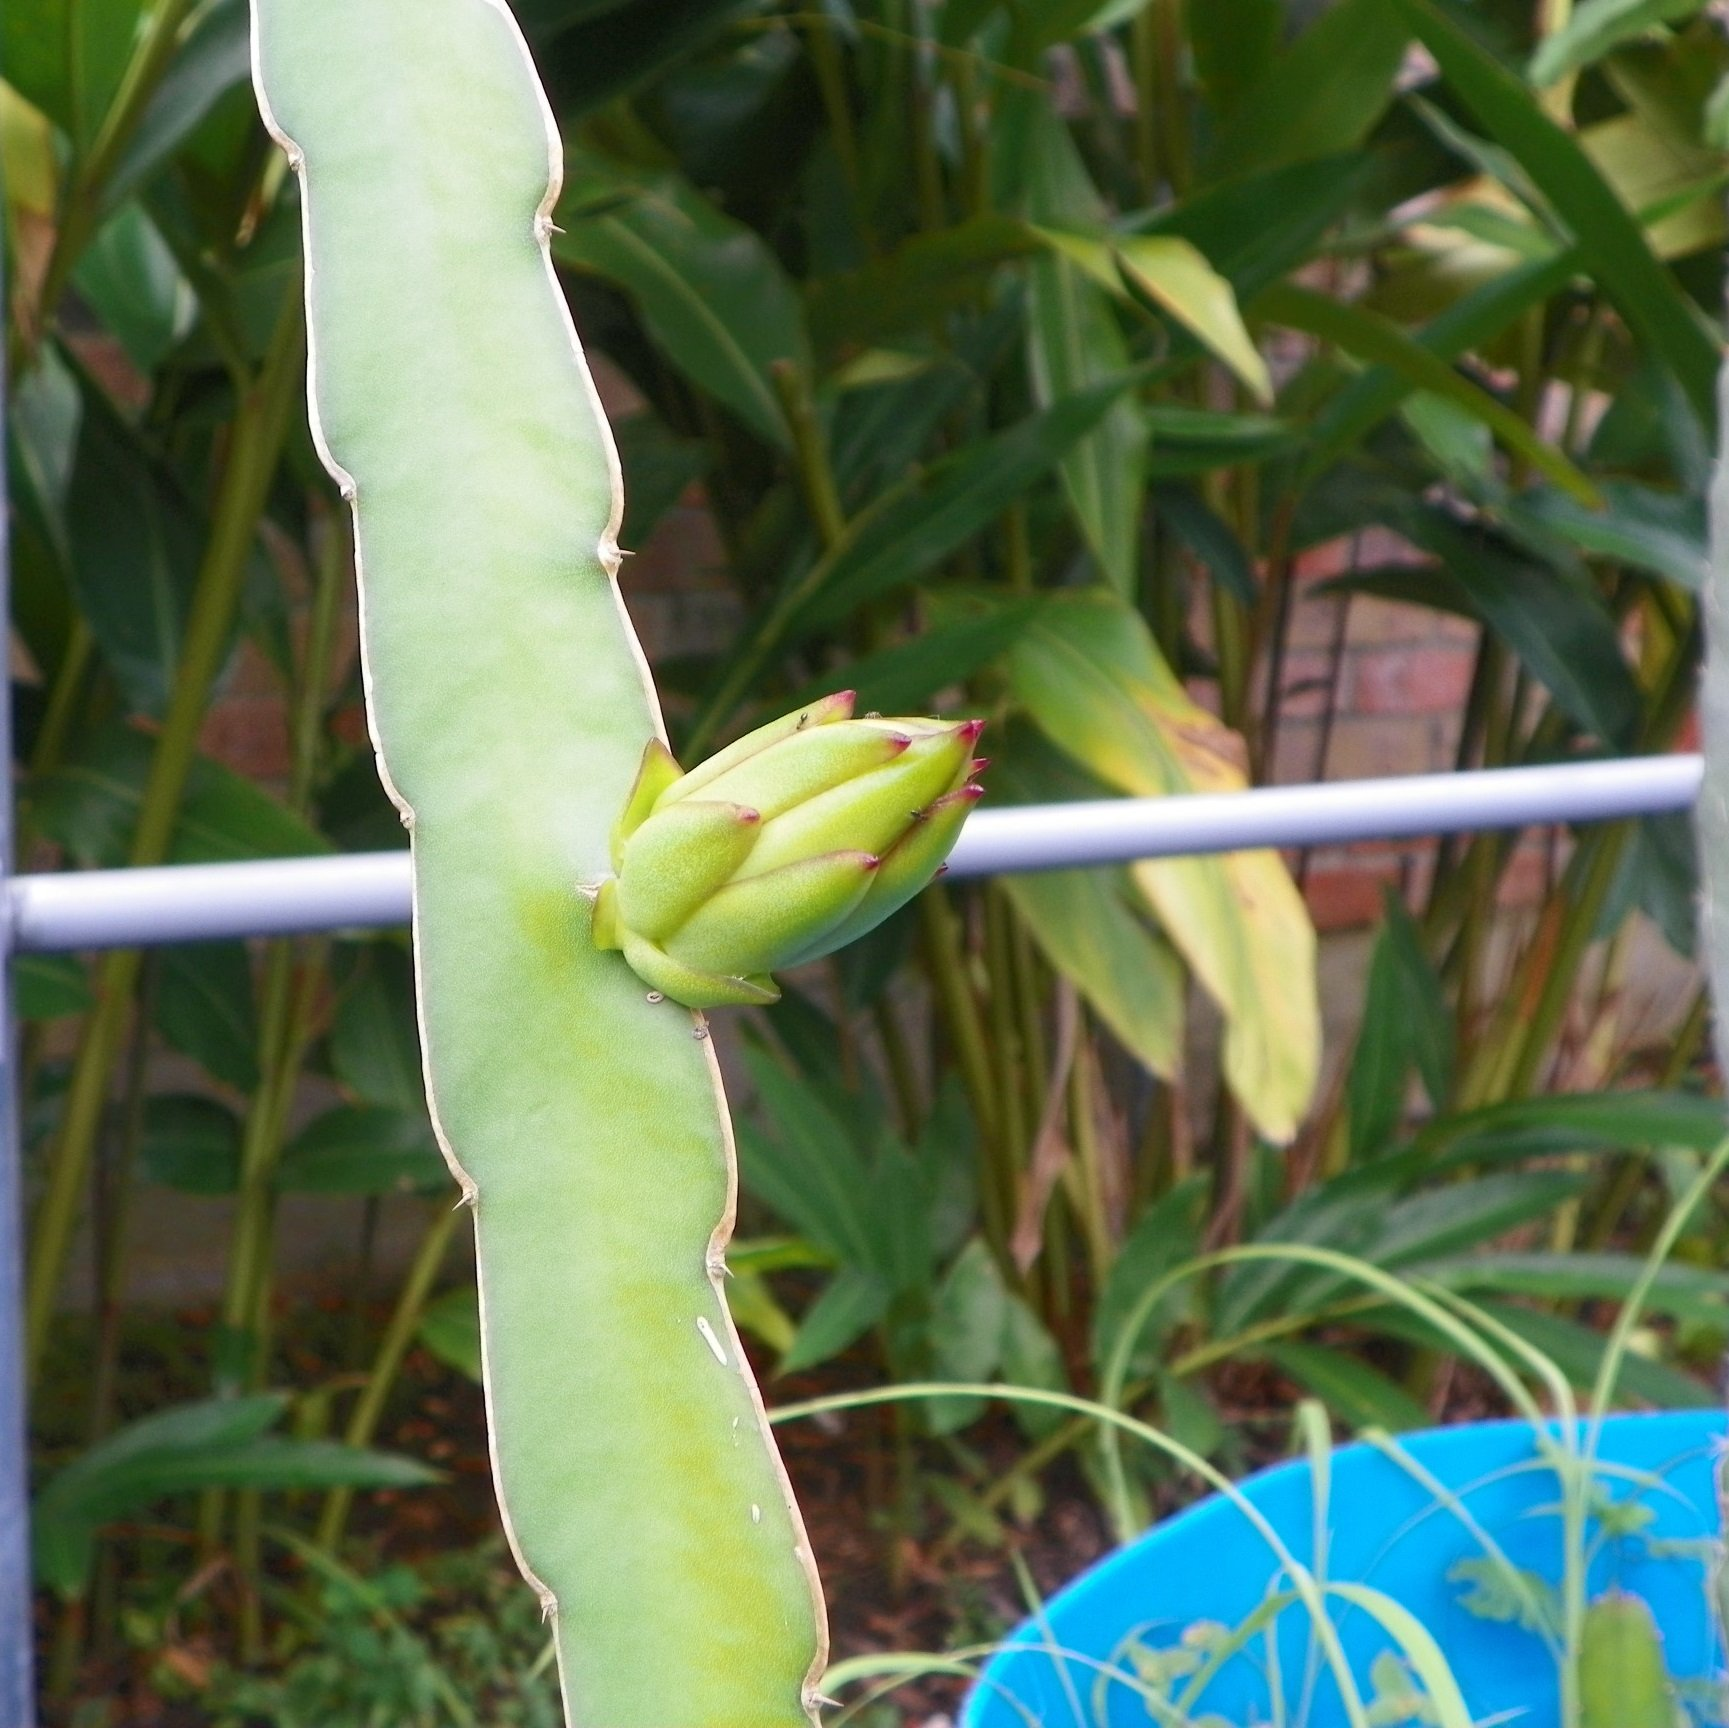 Dragon Fruit variety White Sapphire flower bud